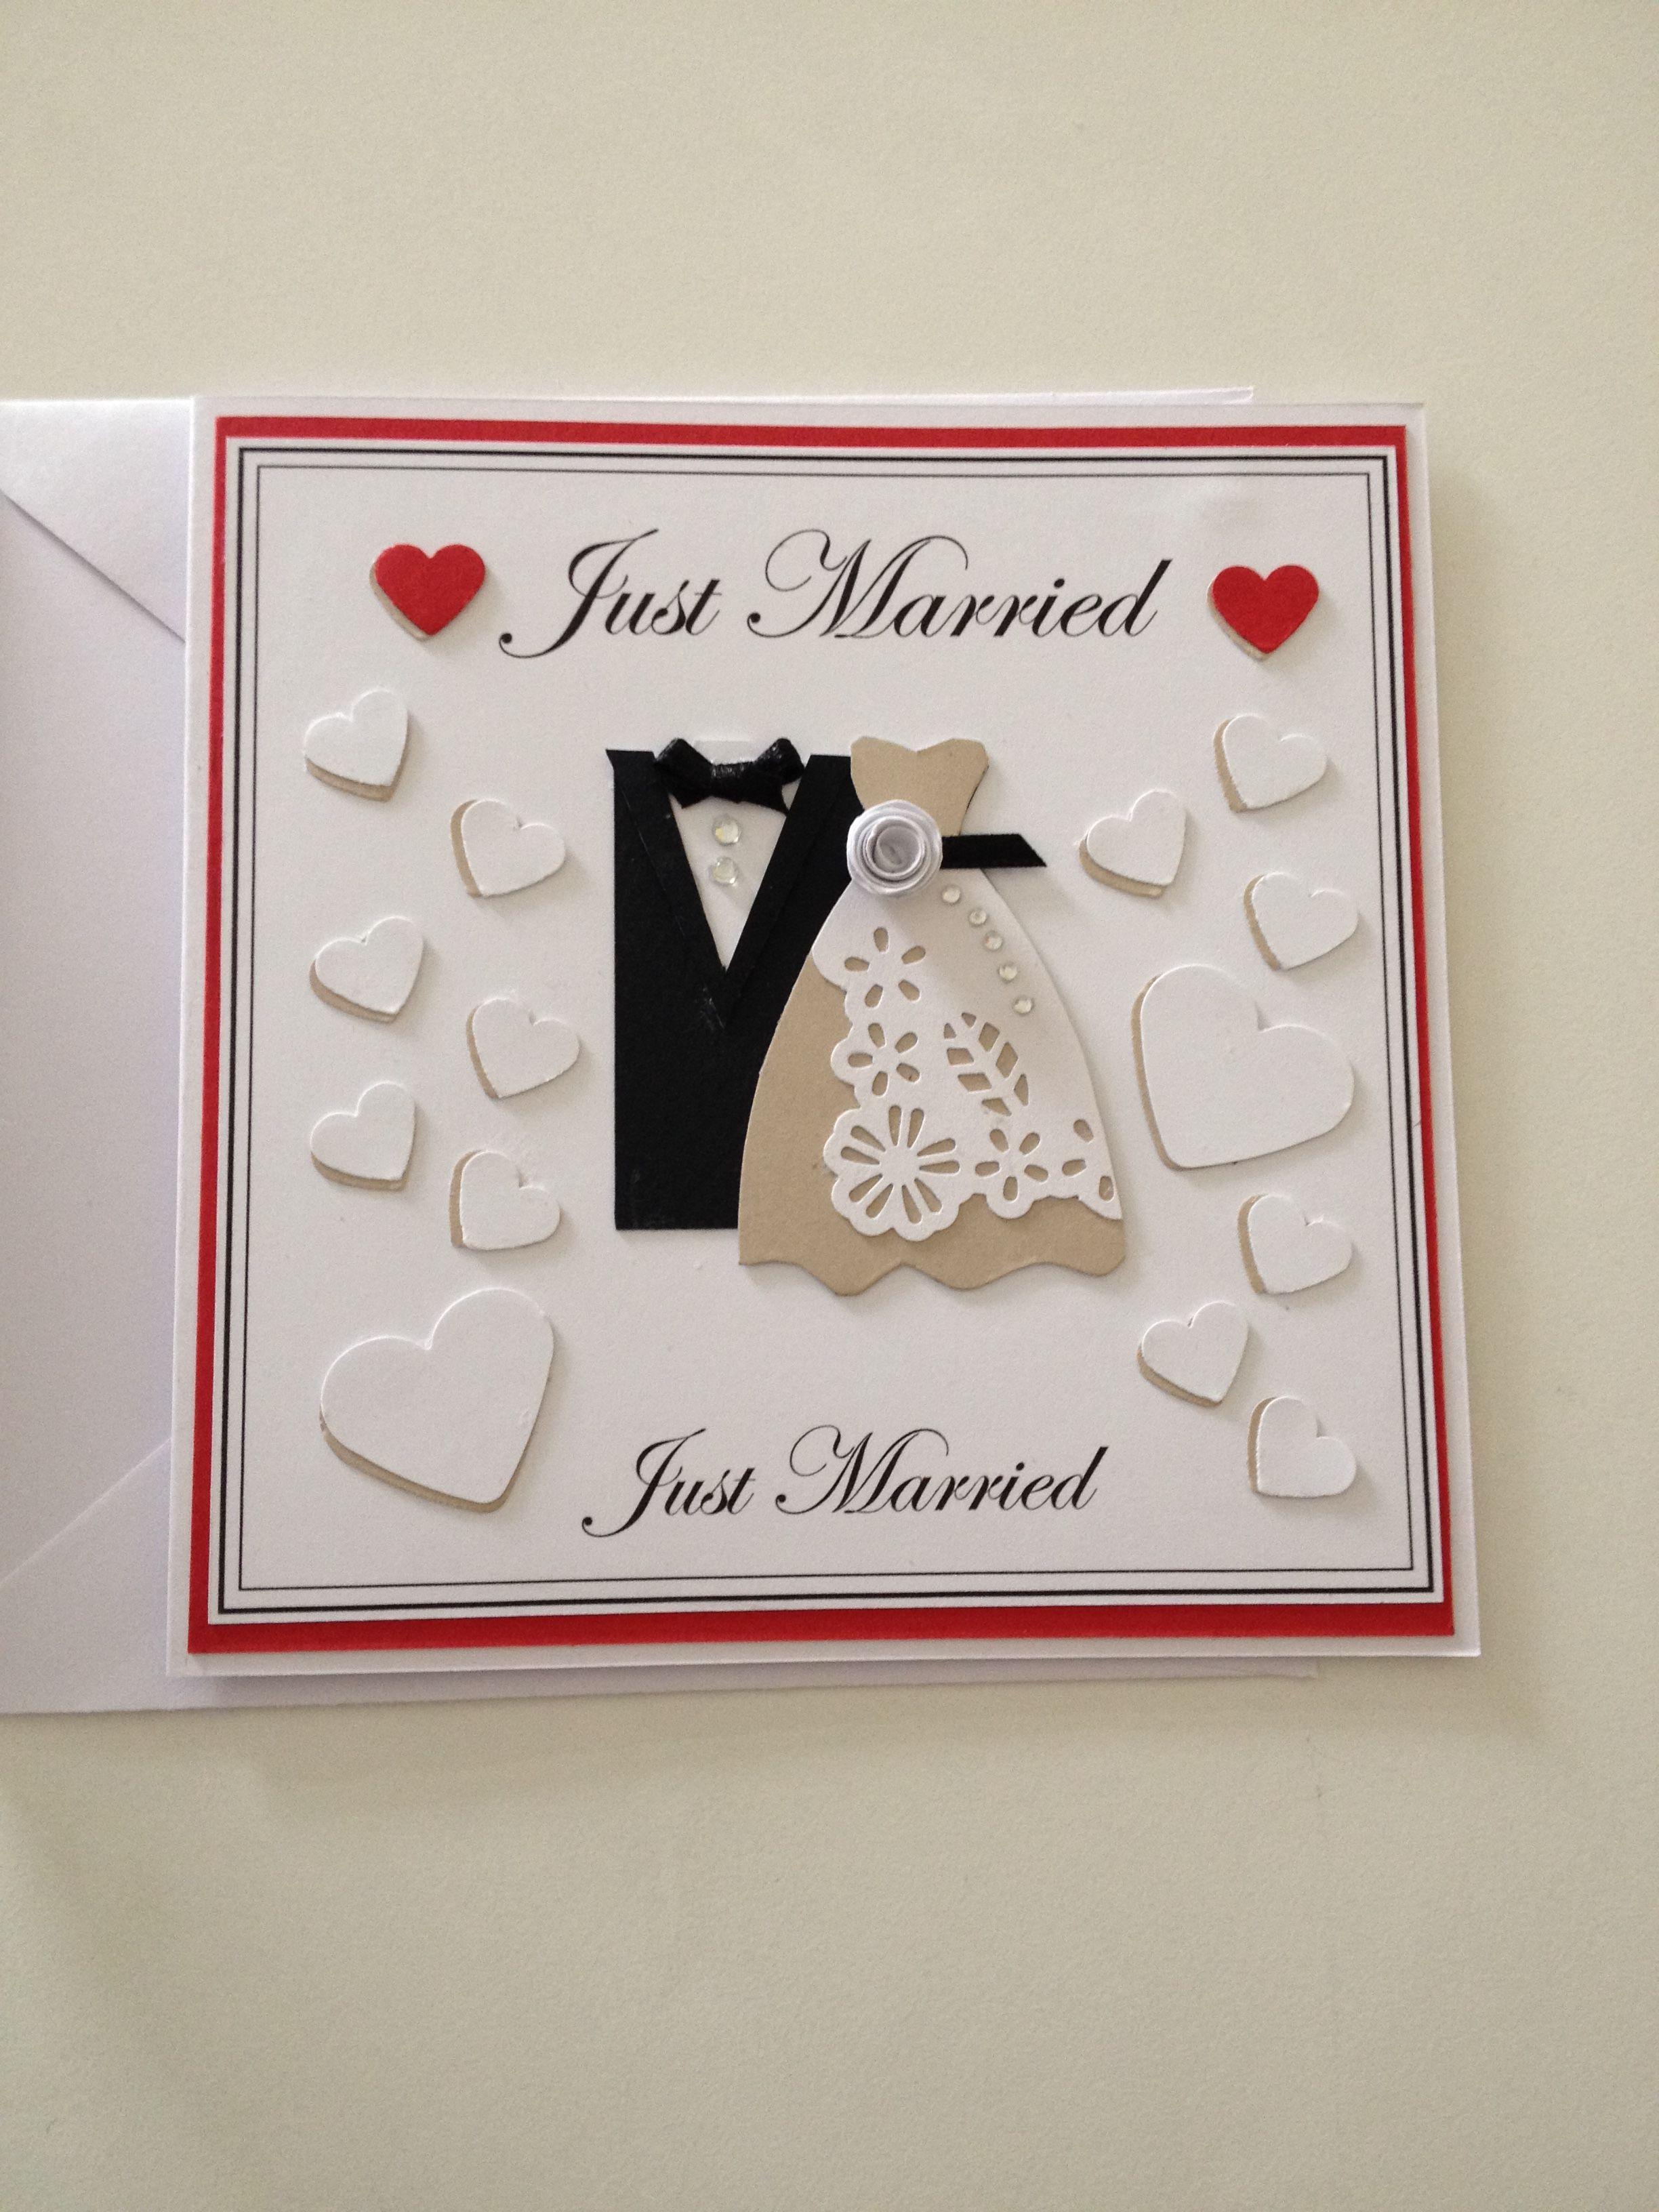 Matrimonio Auguri Biglietto : Biglietto auguri matrimonio pinterest